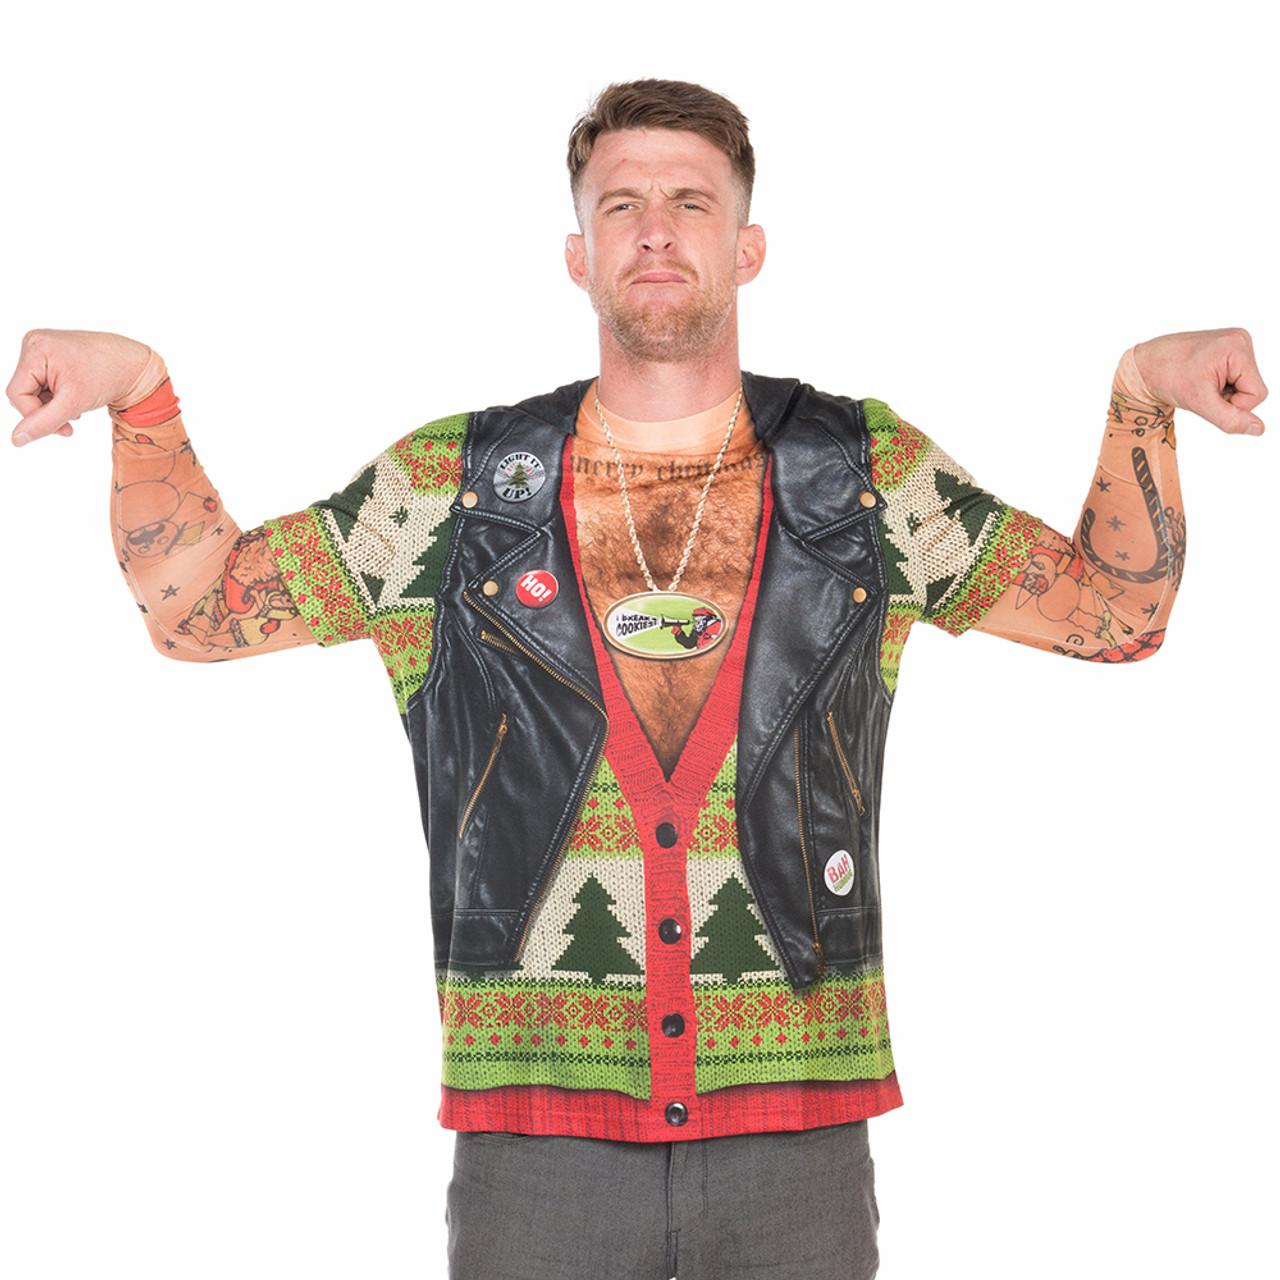 cb14ed30 Faux Real Men's Christmas Biker Sweater with Tattoos | RetroFestive.ca